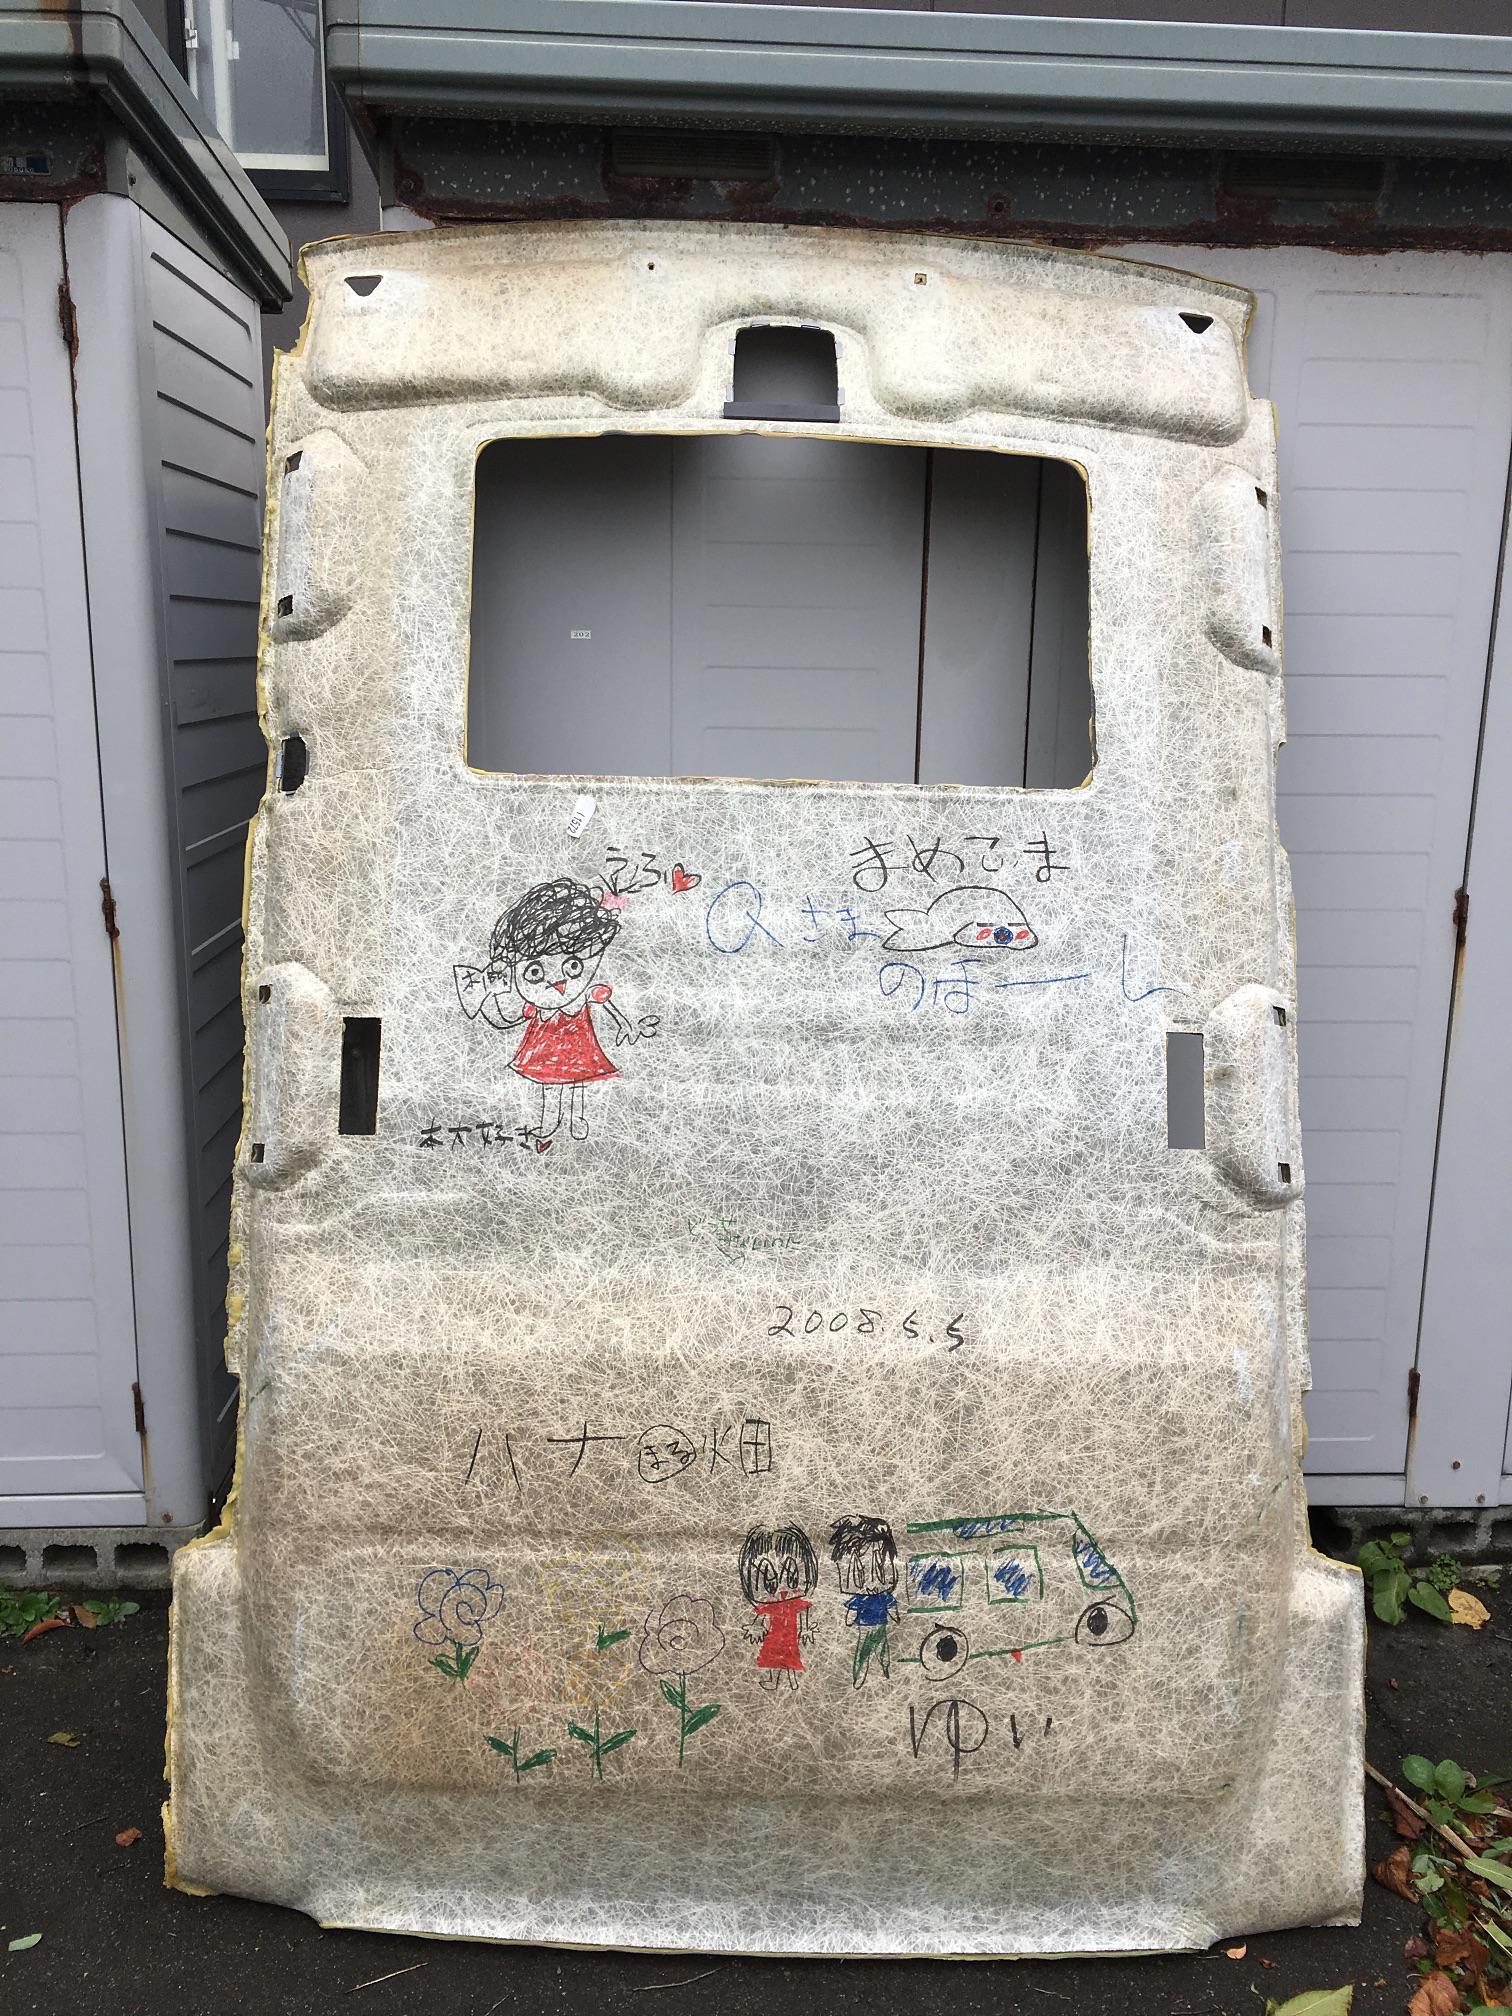 https://p38a.net/repair/2017/09/IMG_52272.jpg